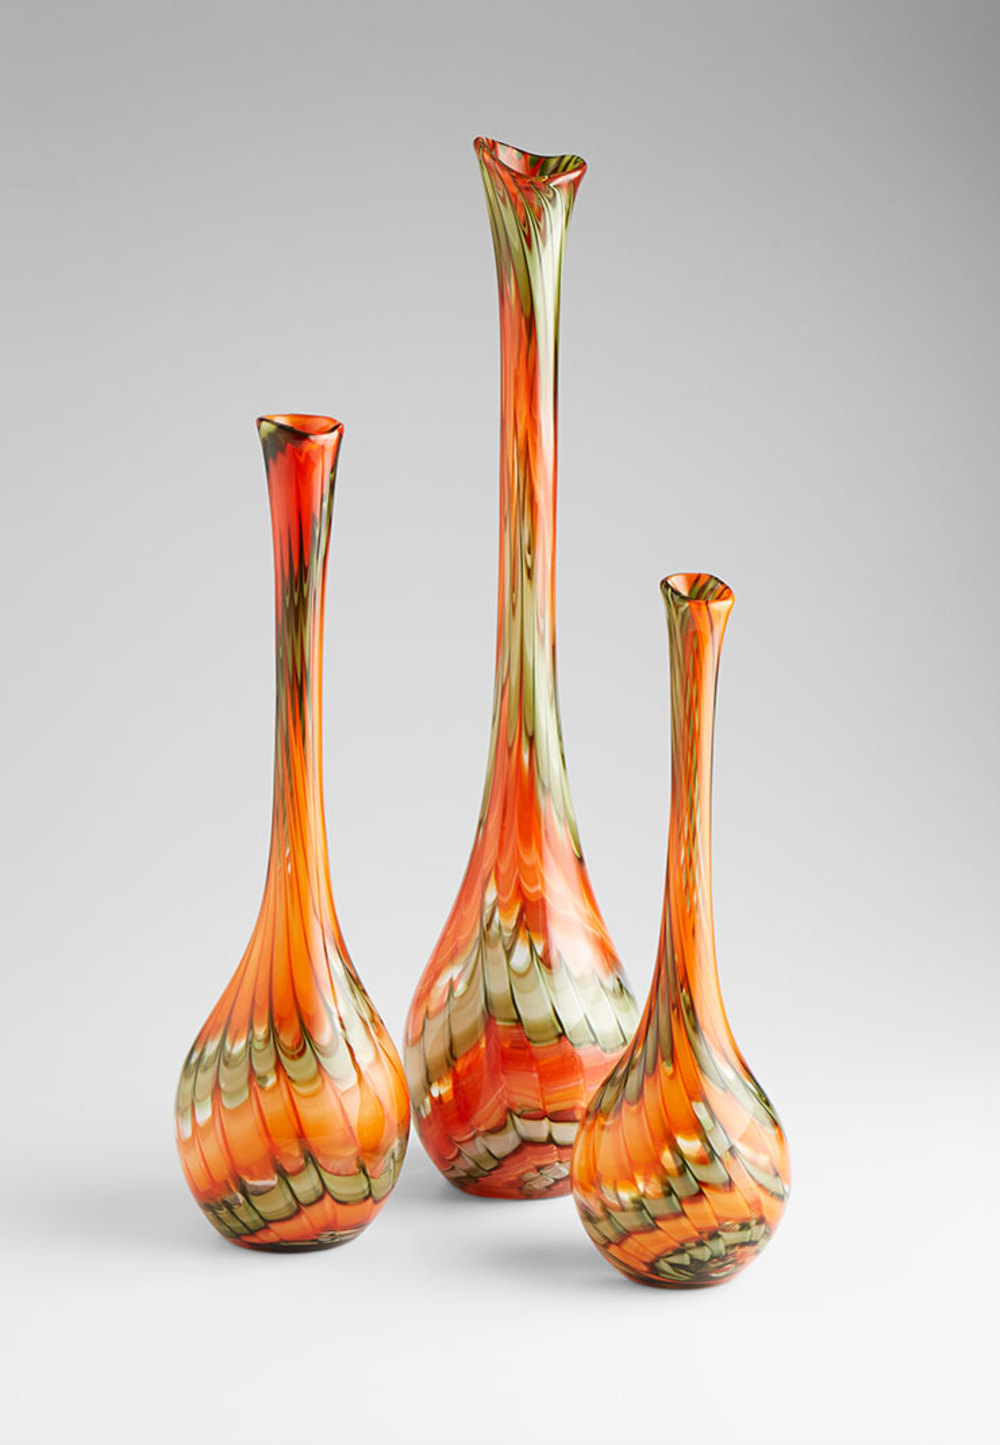 Cyan Designs - Small Atu Vase